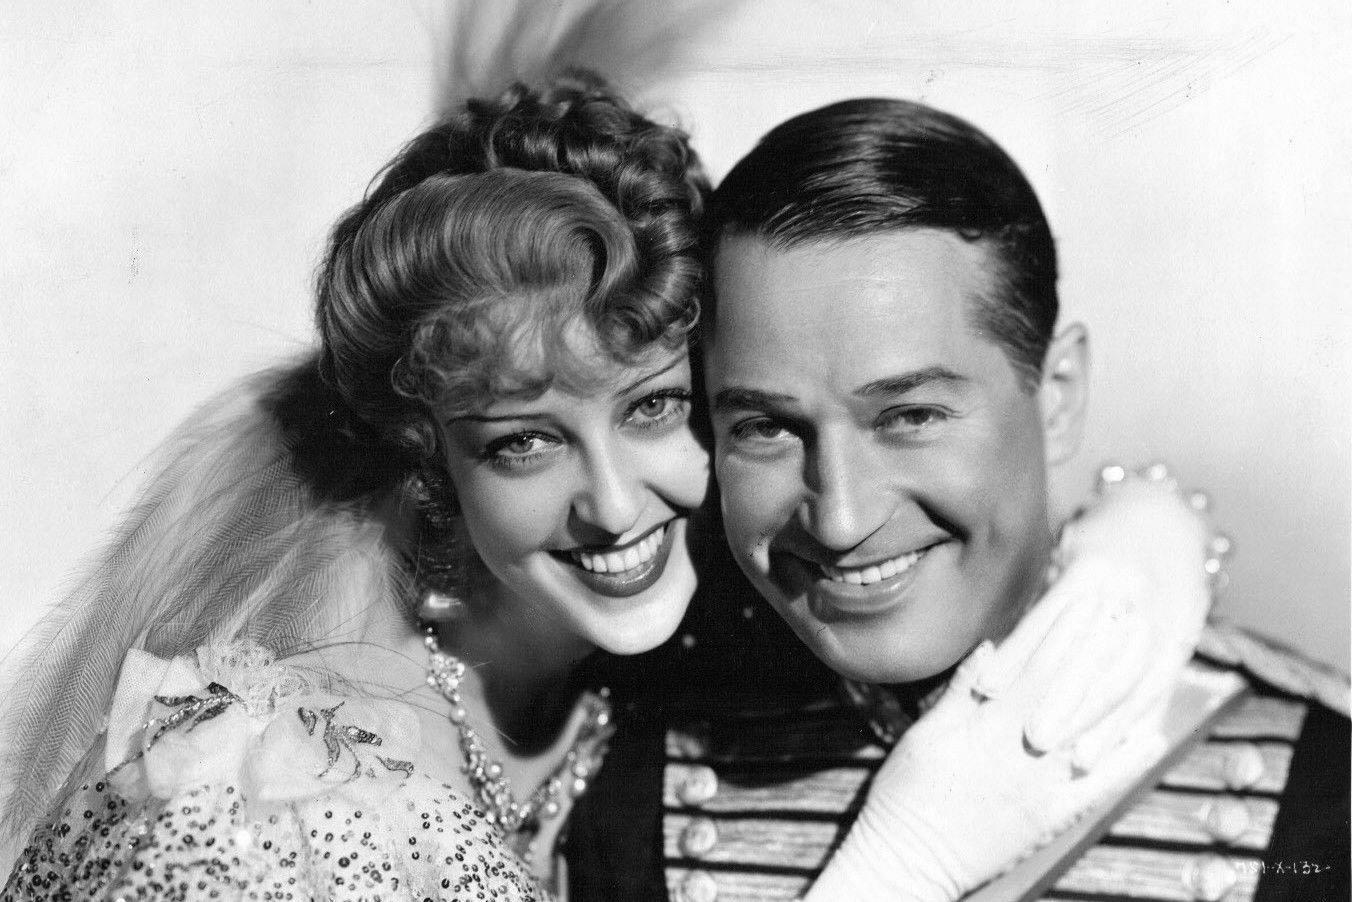 Maurice Chevalier, Jeanette MacDonald